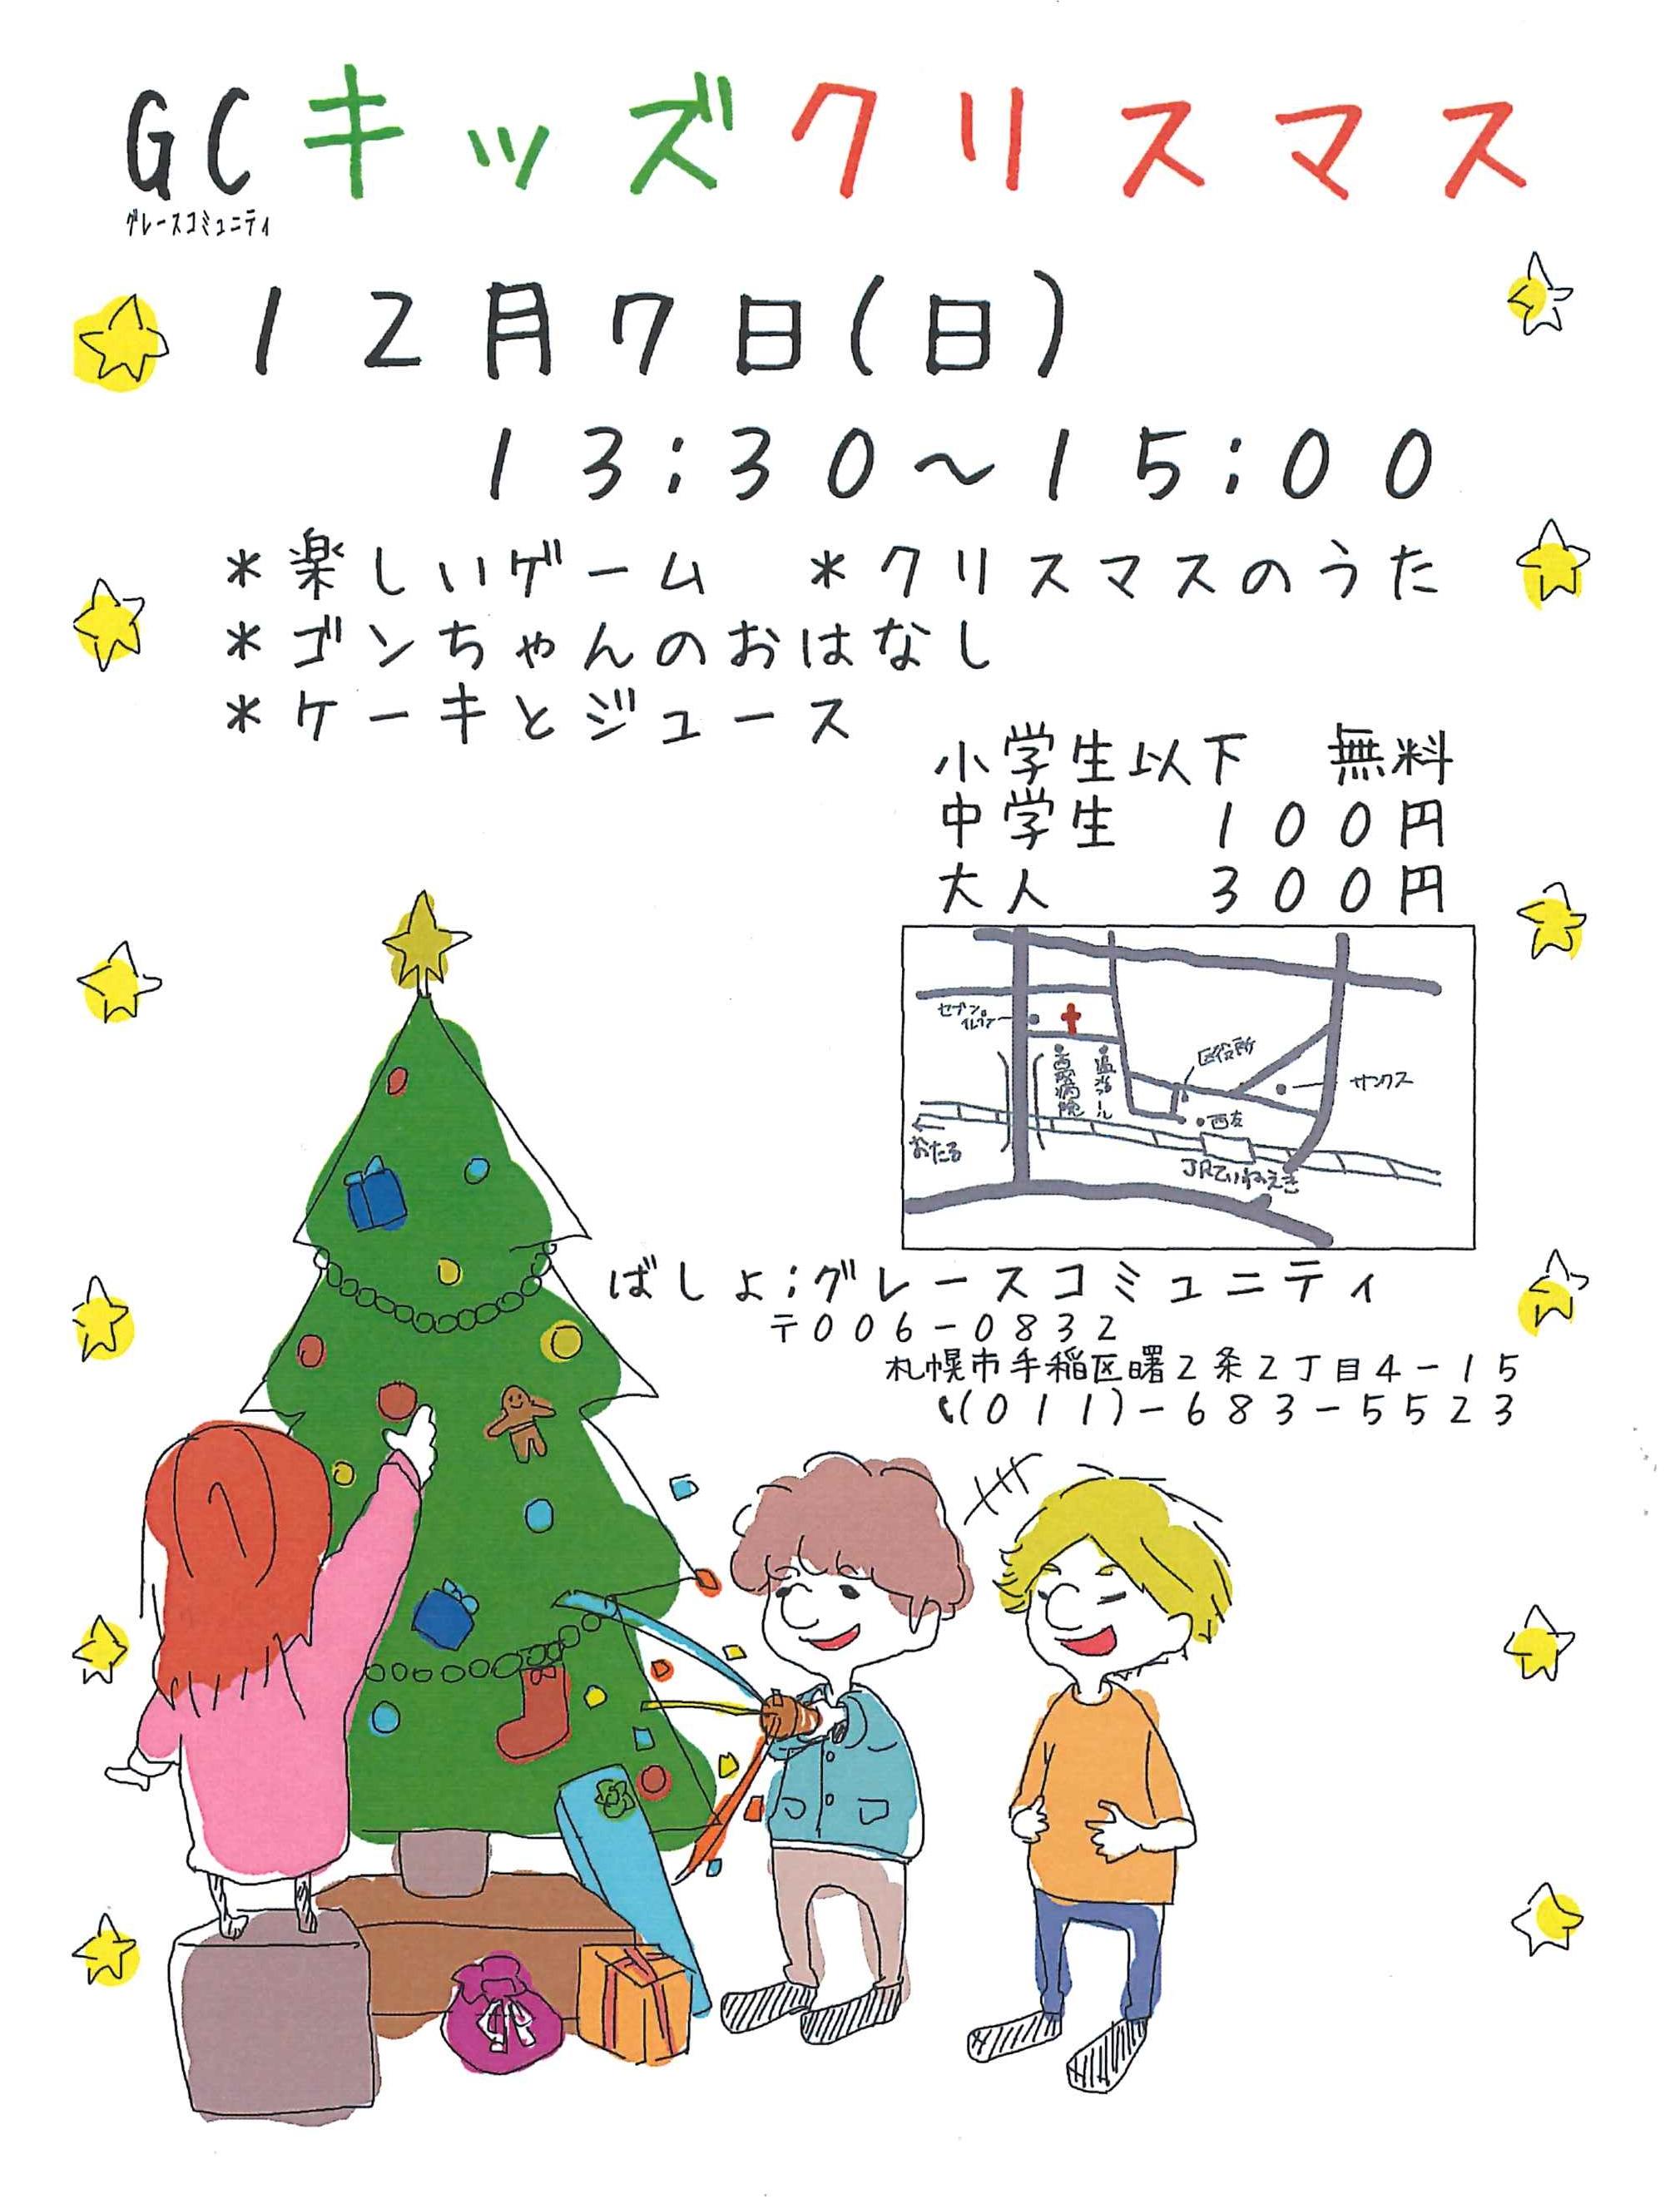 GCキッズクリスマス(2014.12.7)